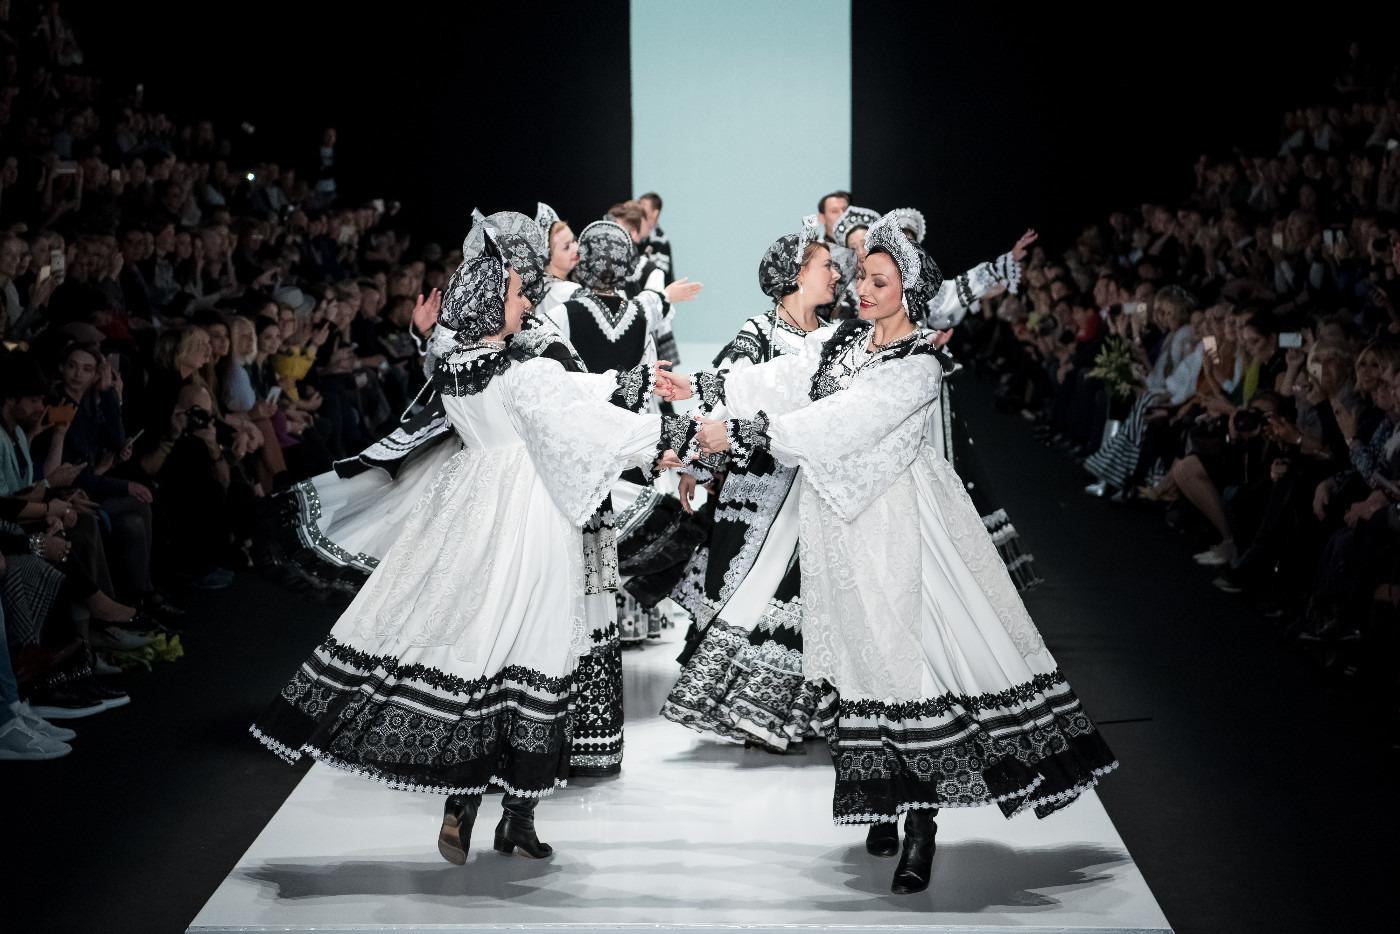 6547485ddb1d SLAVA ZAITSEV. Mercedes-Benz Fashion Week Russia. Весна-лето 2017    Intermoda.Ru - новости мировой индустрии моды и России